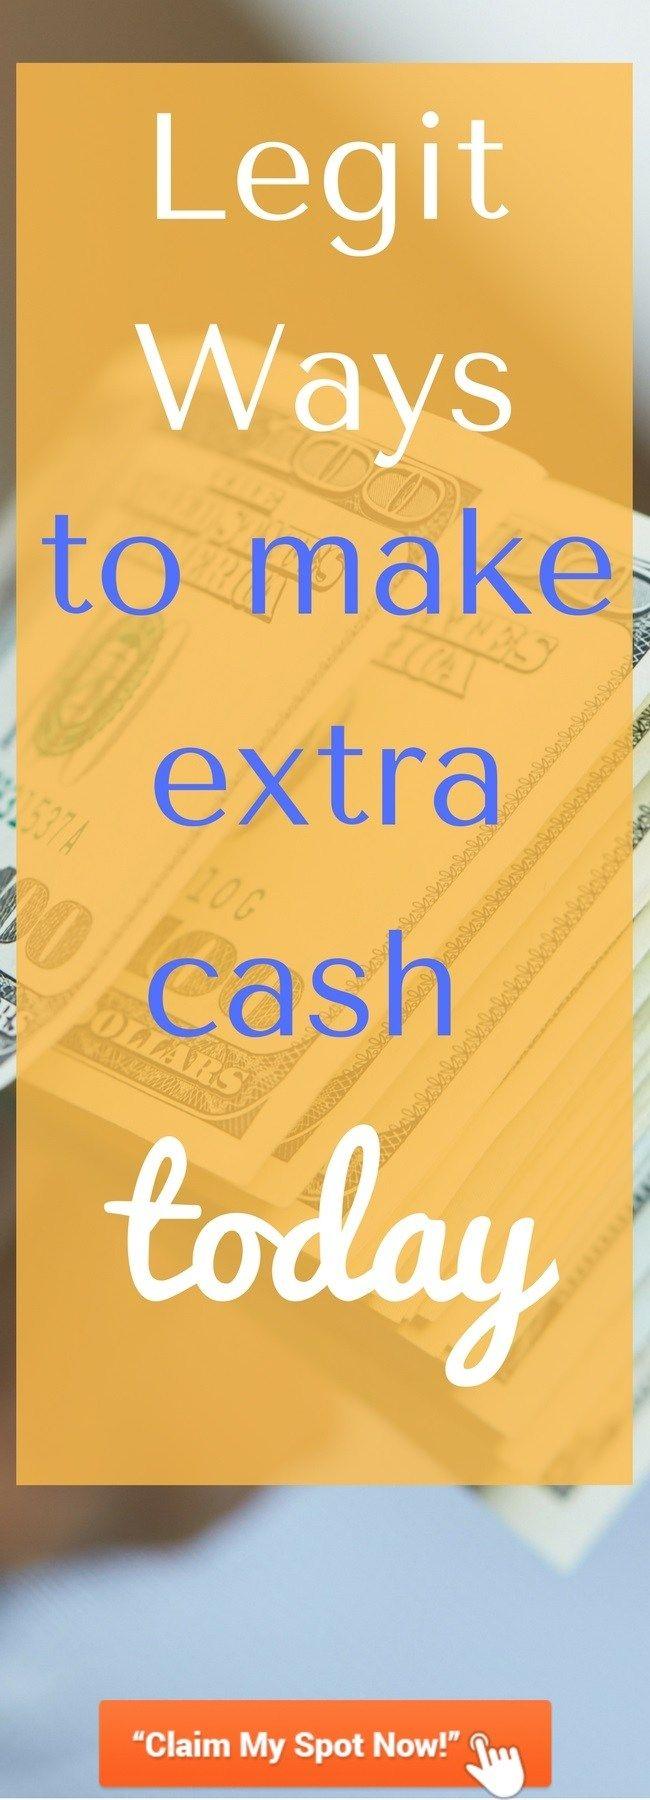 Gta 5 How To Make Money On Stocks